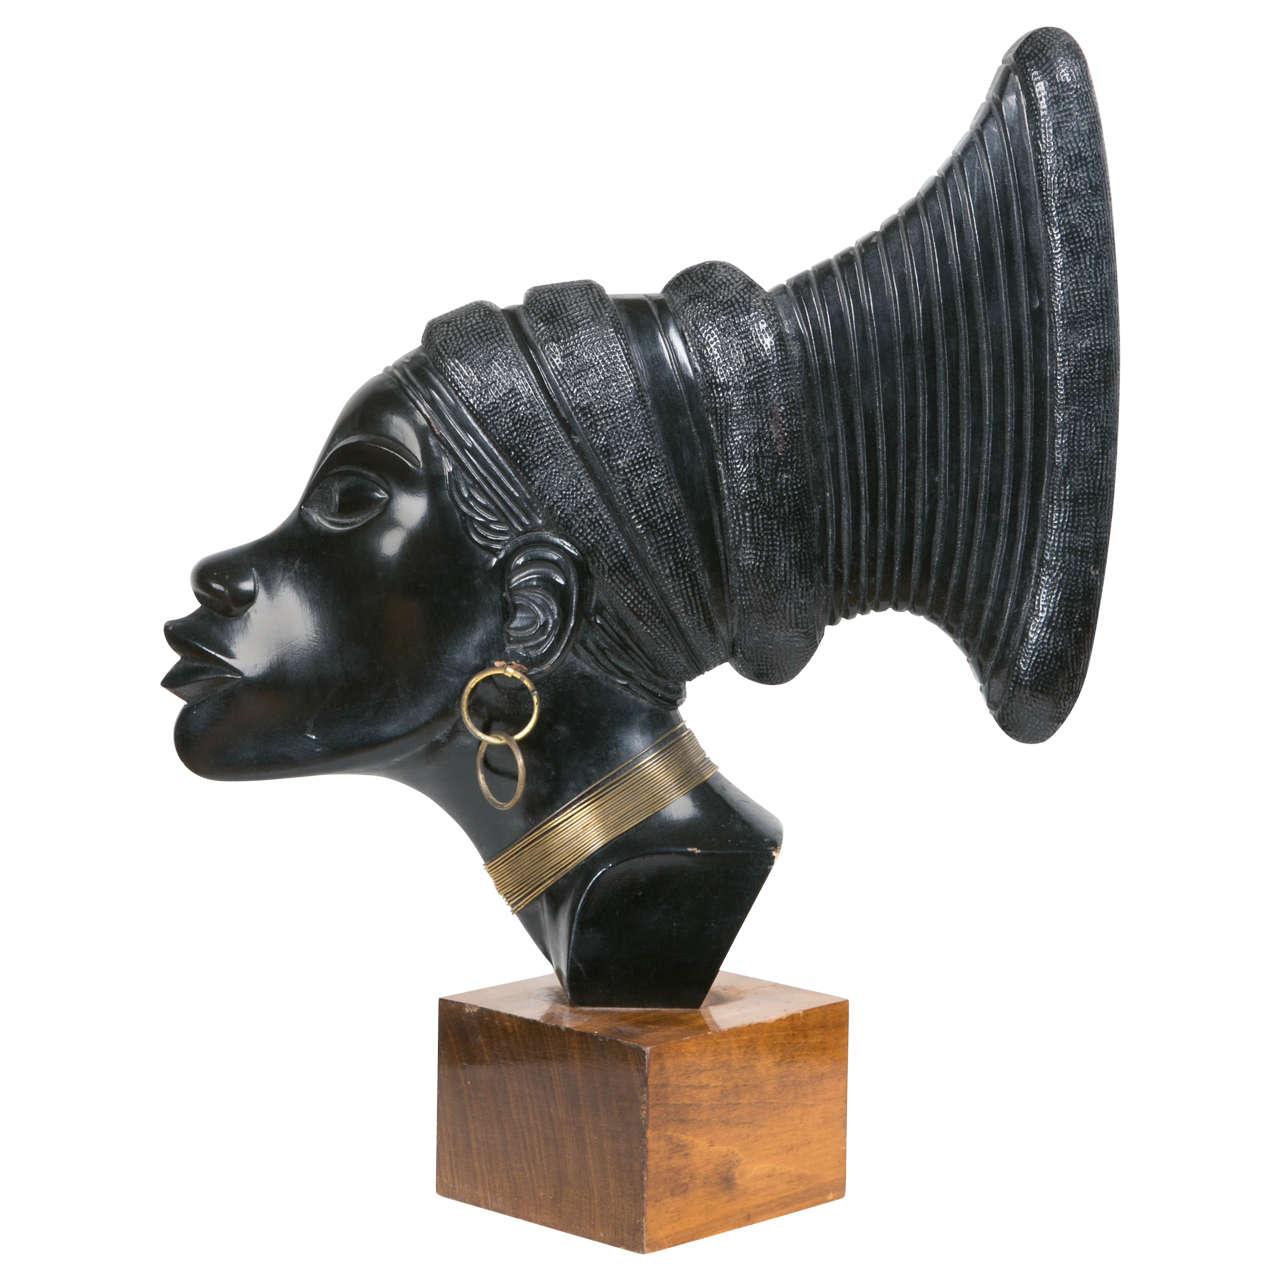 Art Deco Profile of an African Woman, circa 1930